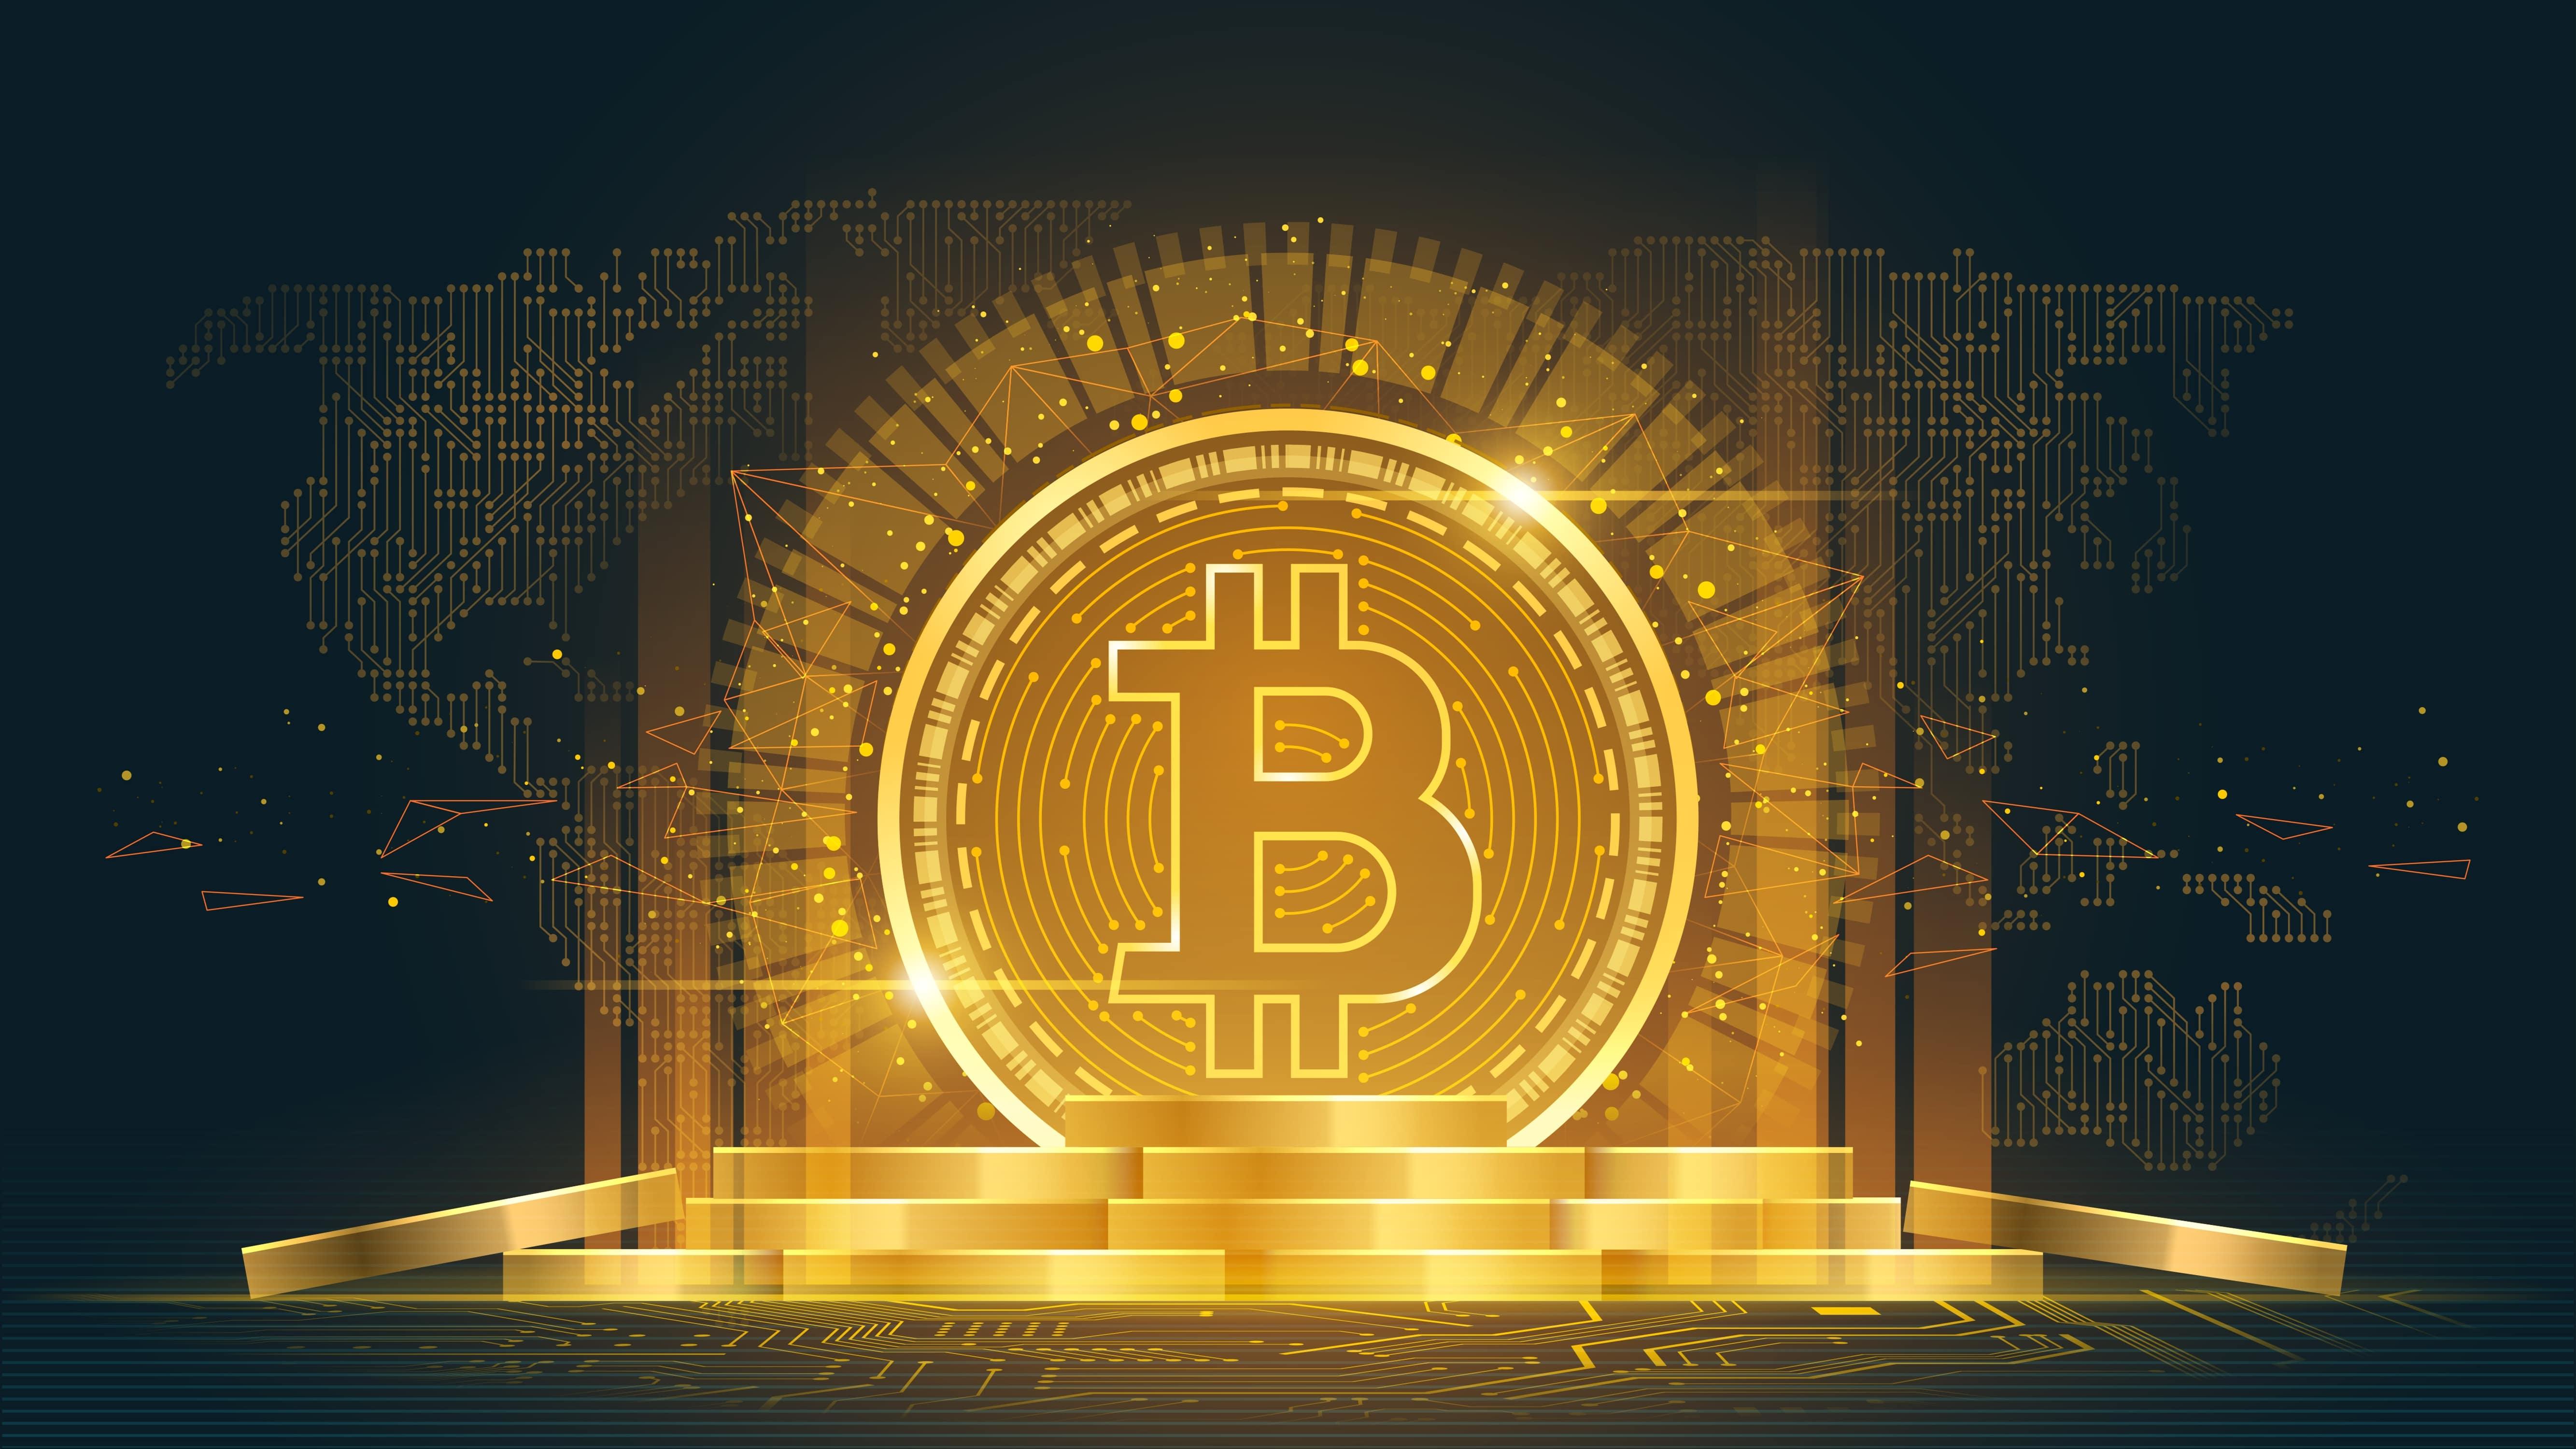 Dự đoán giá Bitcoin năm 2030